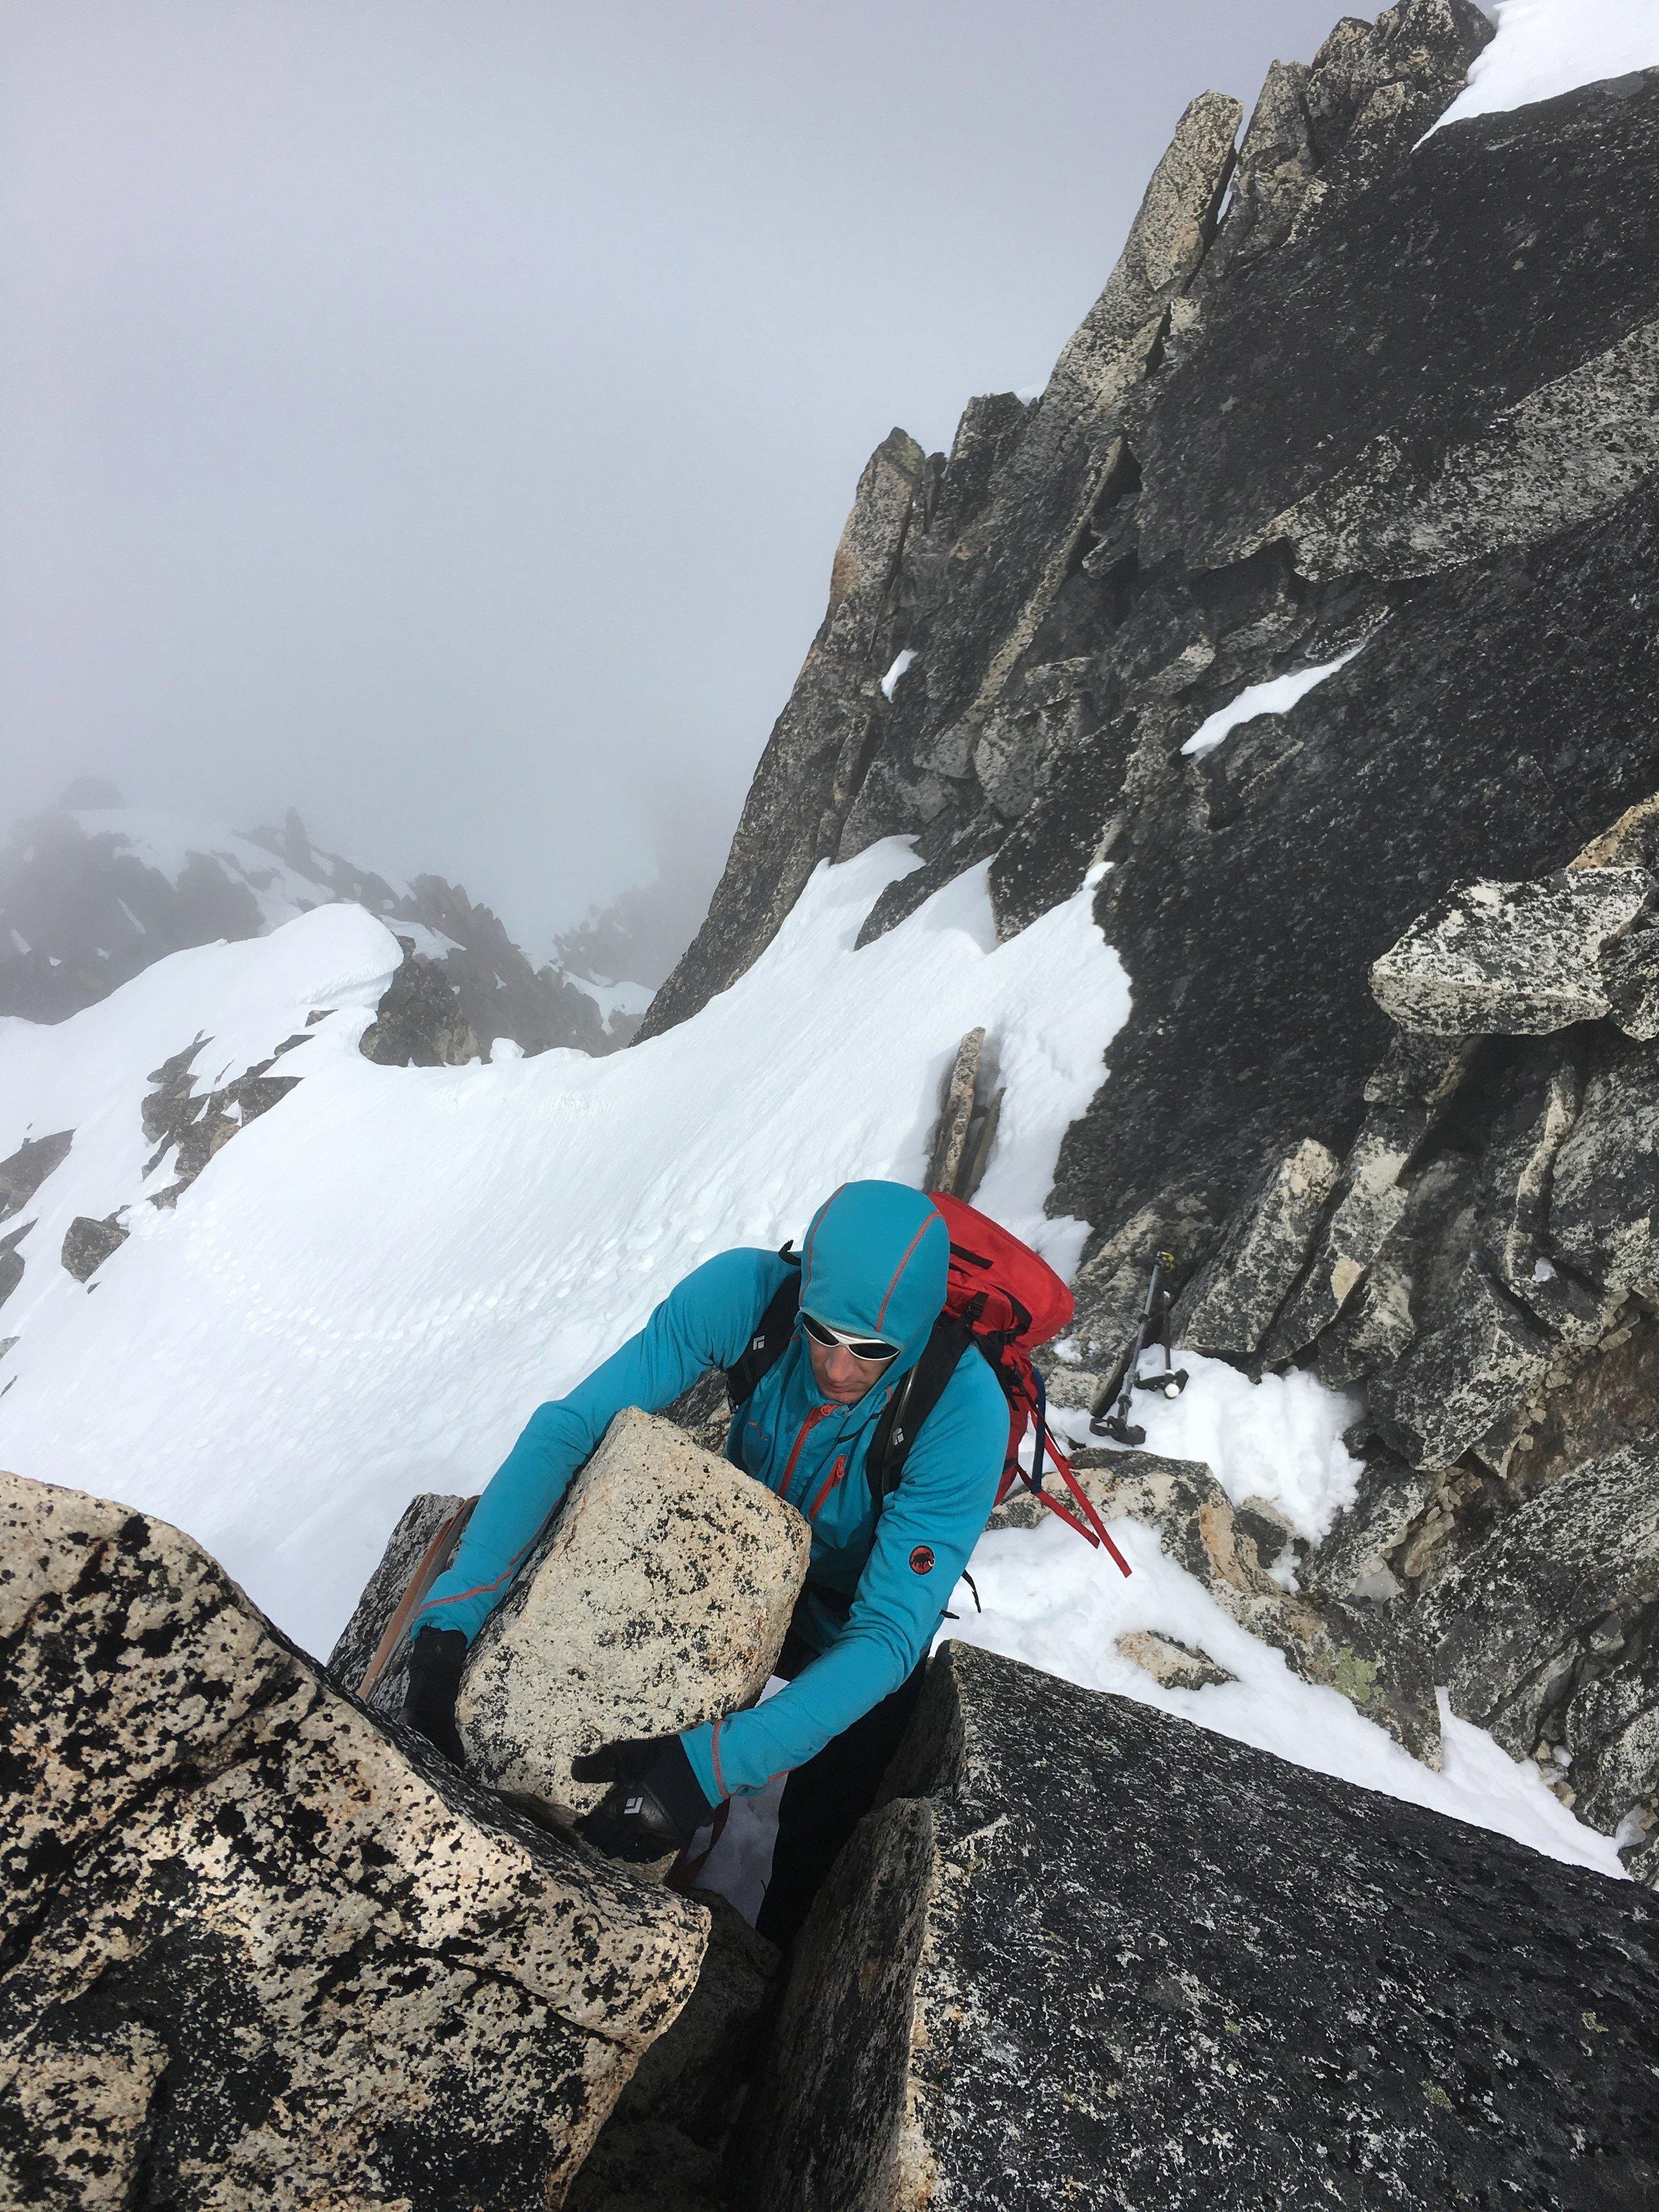 Scrambling to the summit